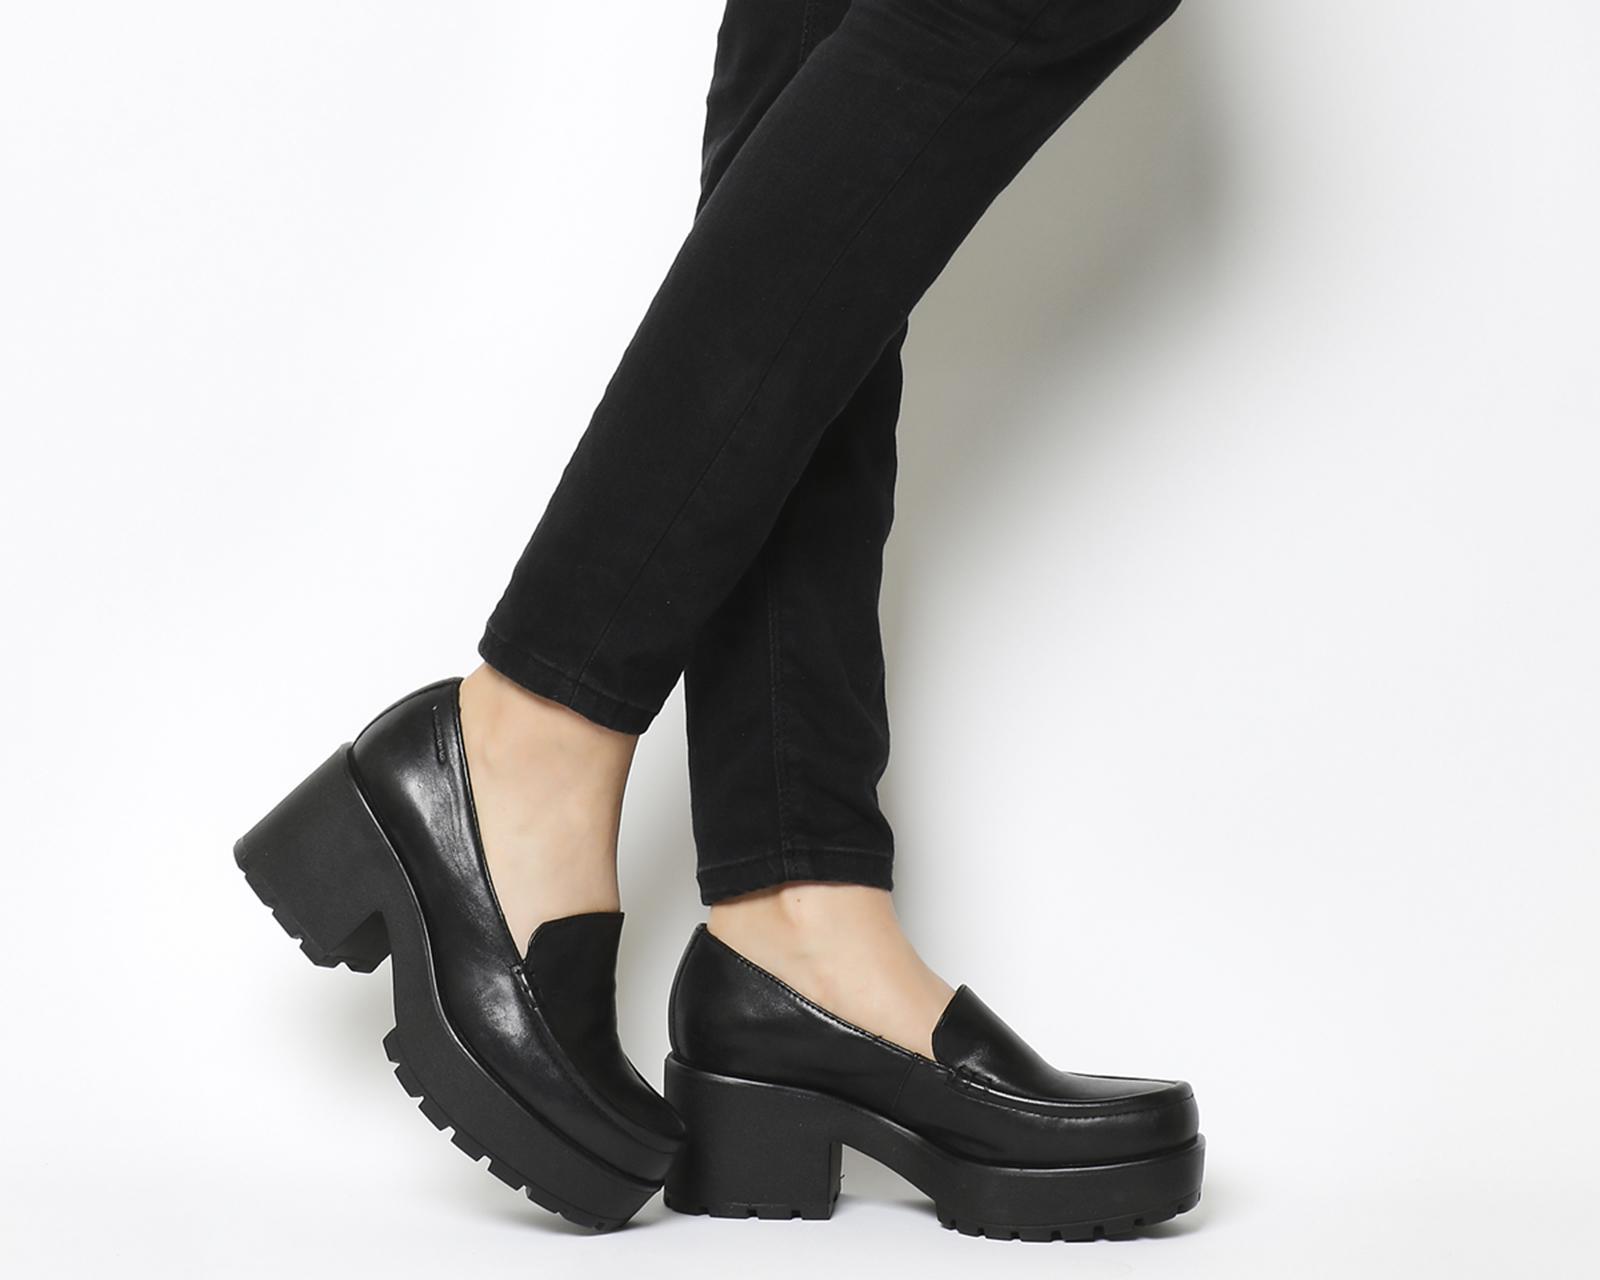 b3071c75f77 Vagabond Dioon Loafers in Black - Lyst